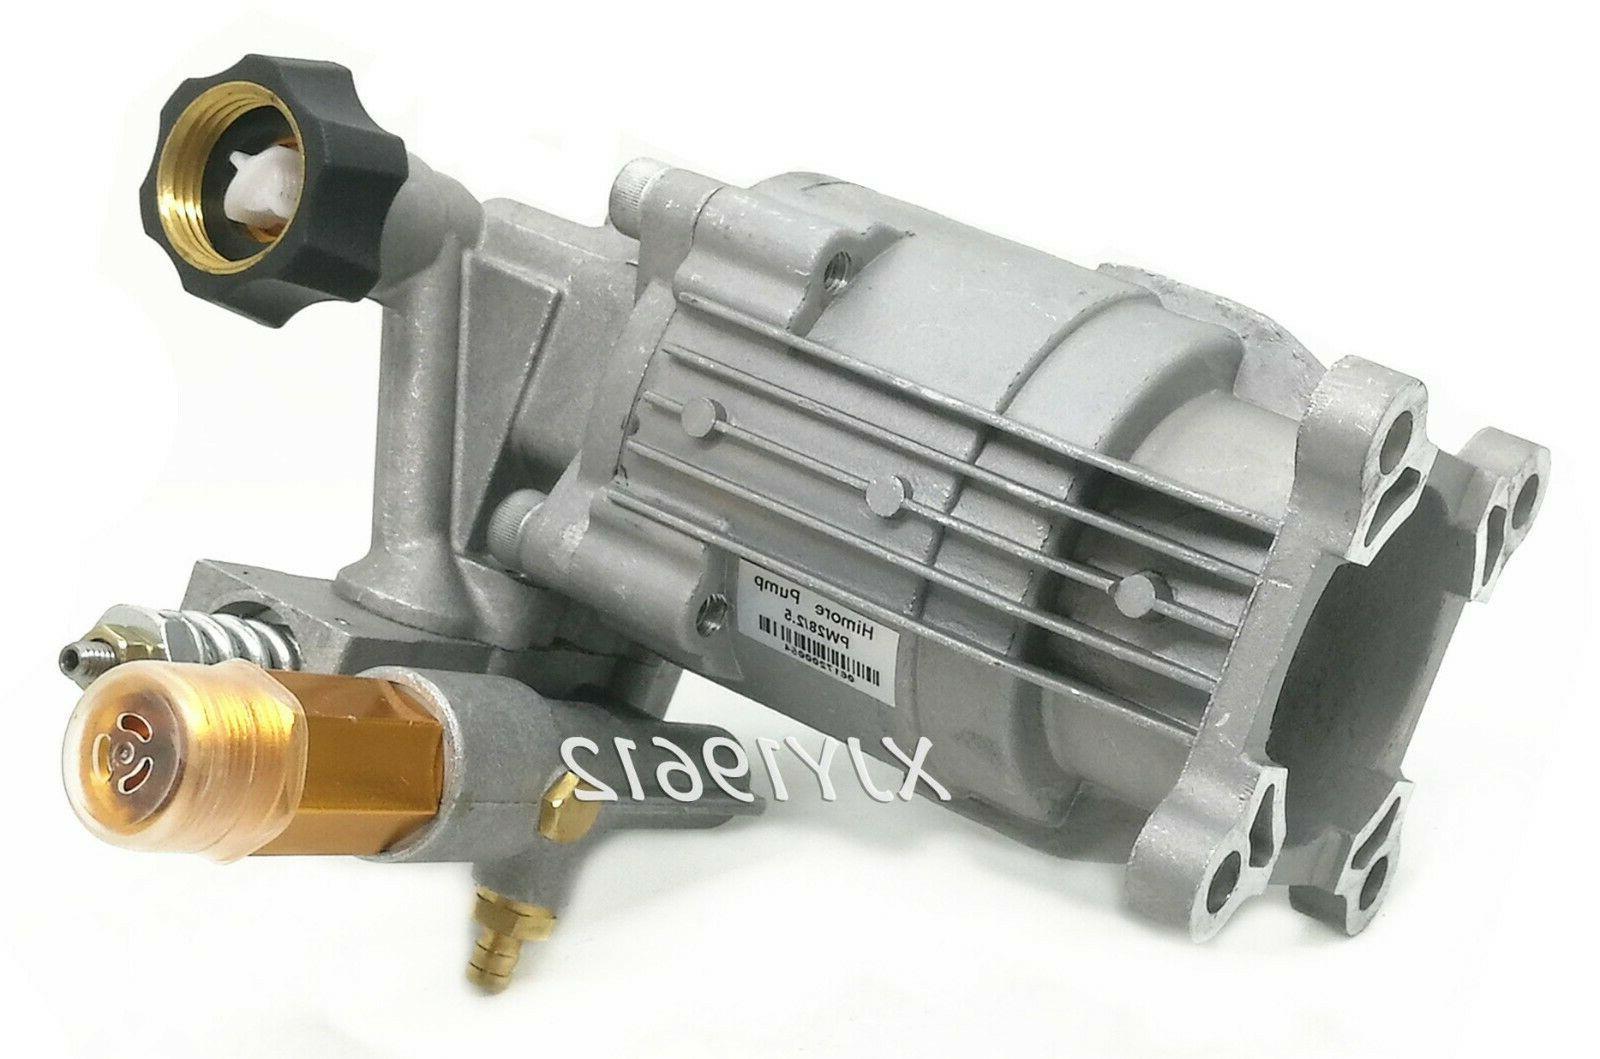 3000 PSI Power Pressure Washer Pump For Honda GC160 GC190 5-